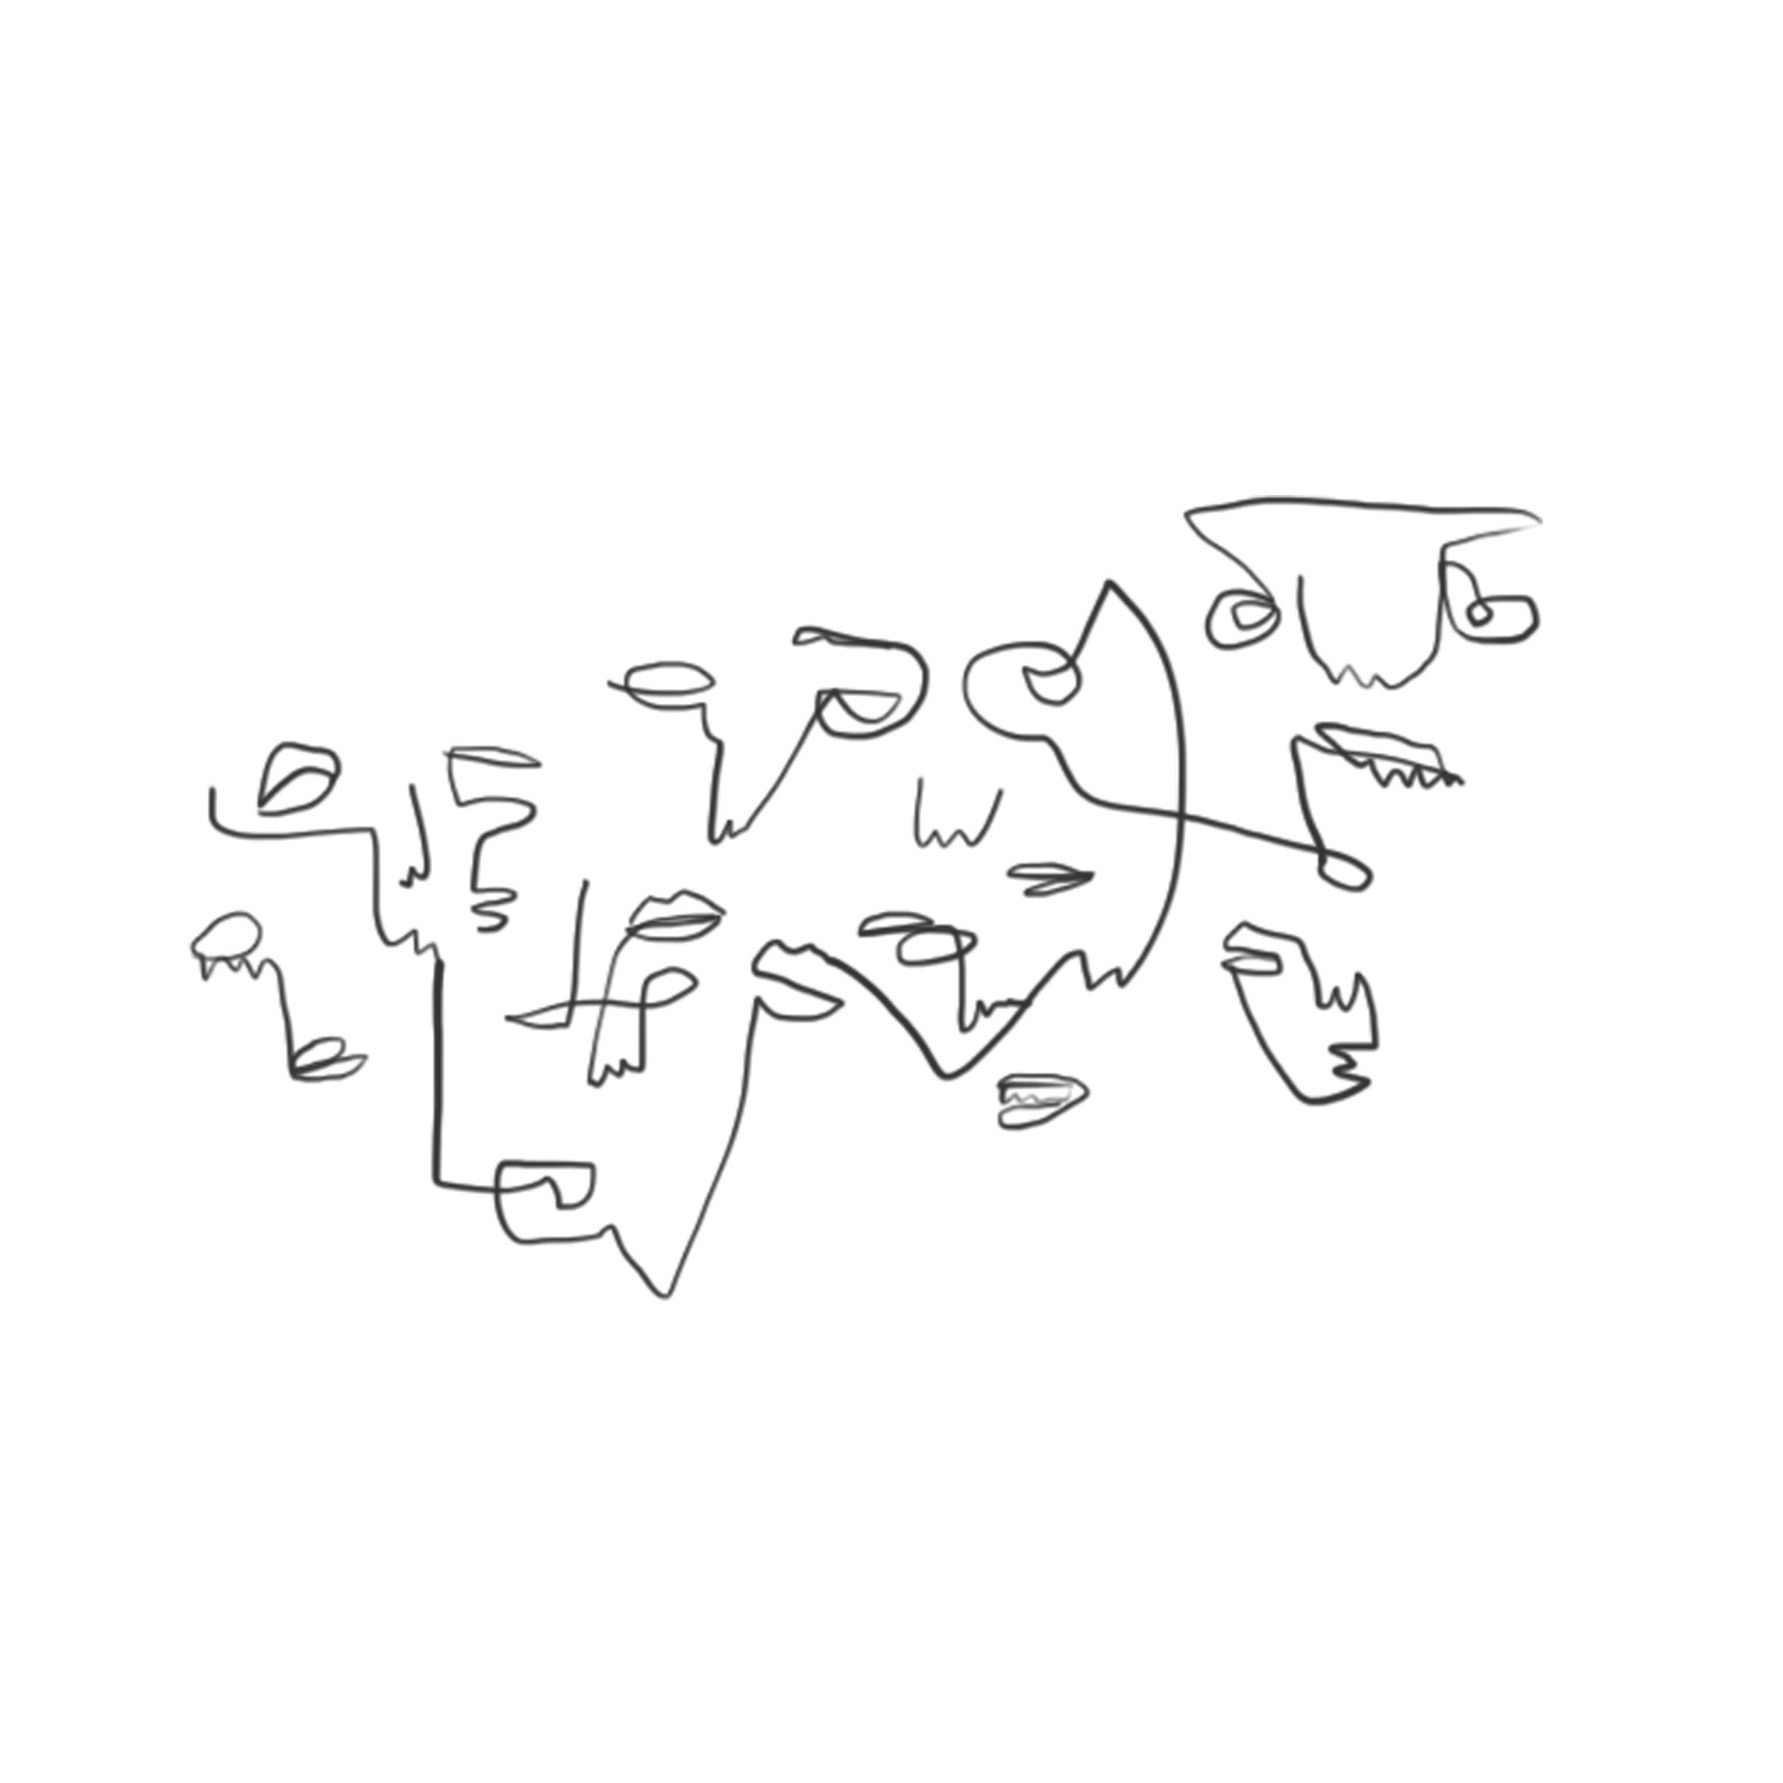 scribblevinefaces (1).jpg